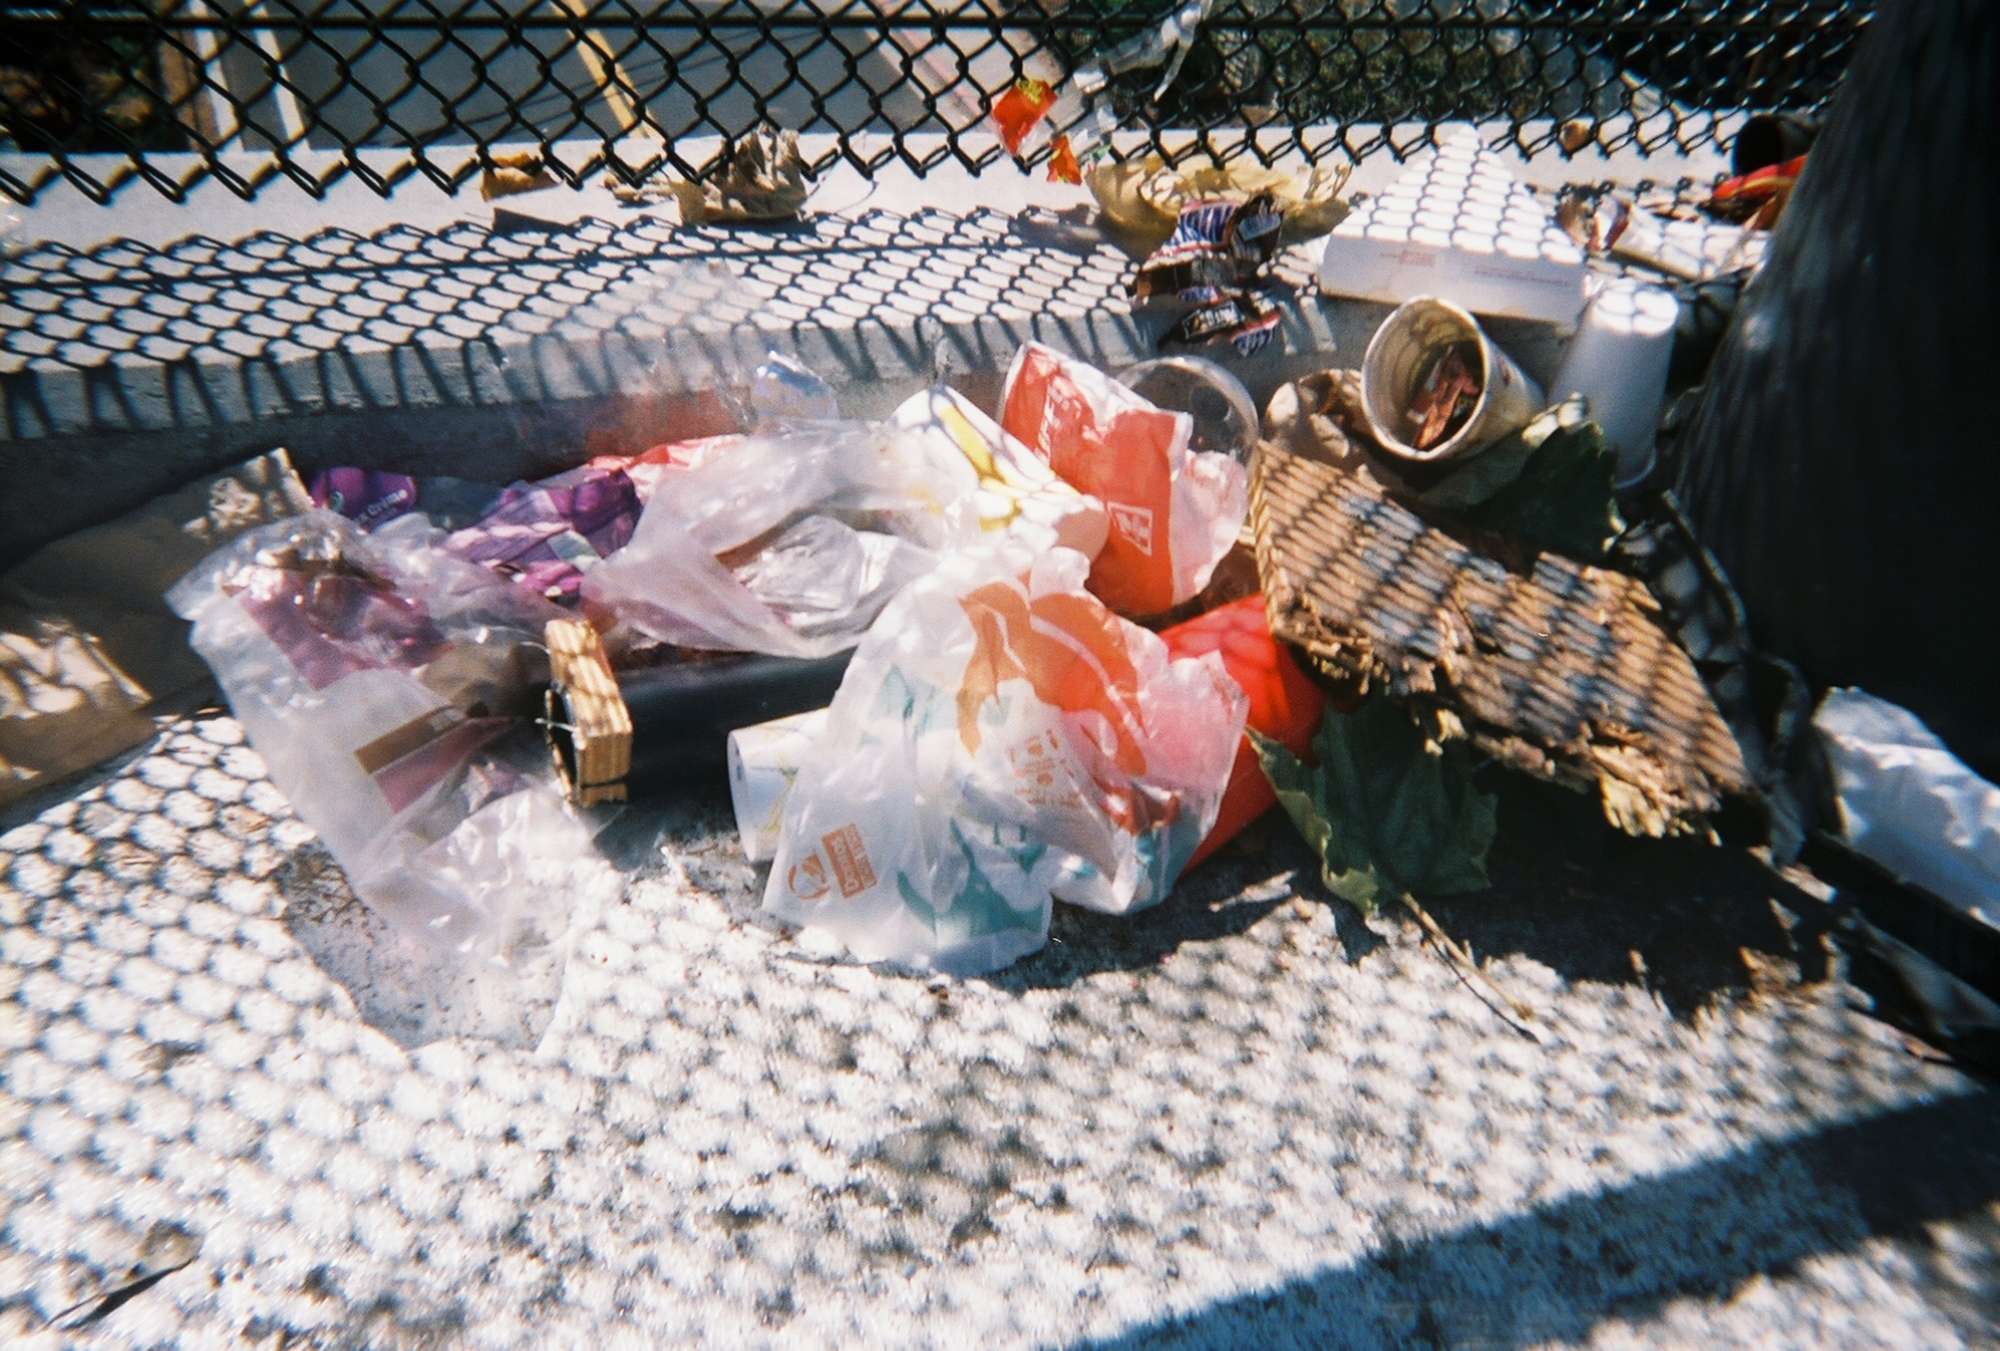 Trash. (Photo courtesy ofSelijah Meacham.)